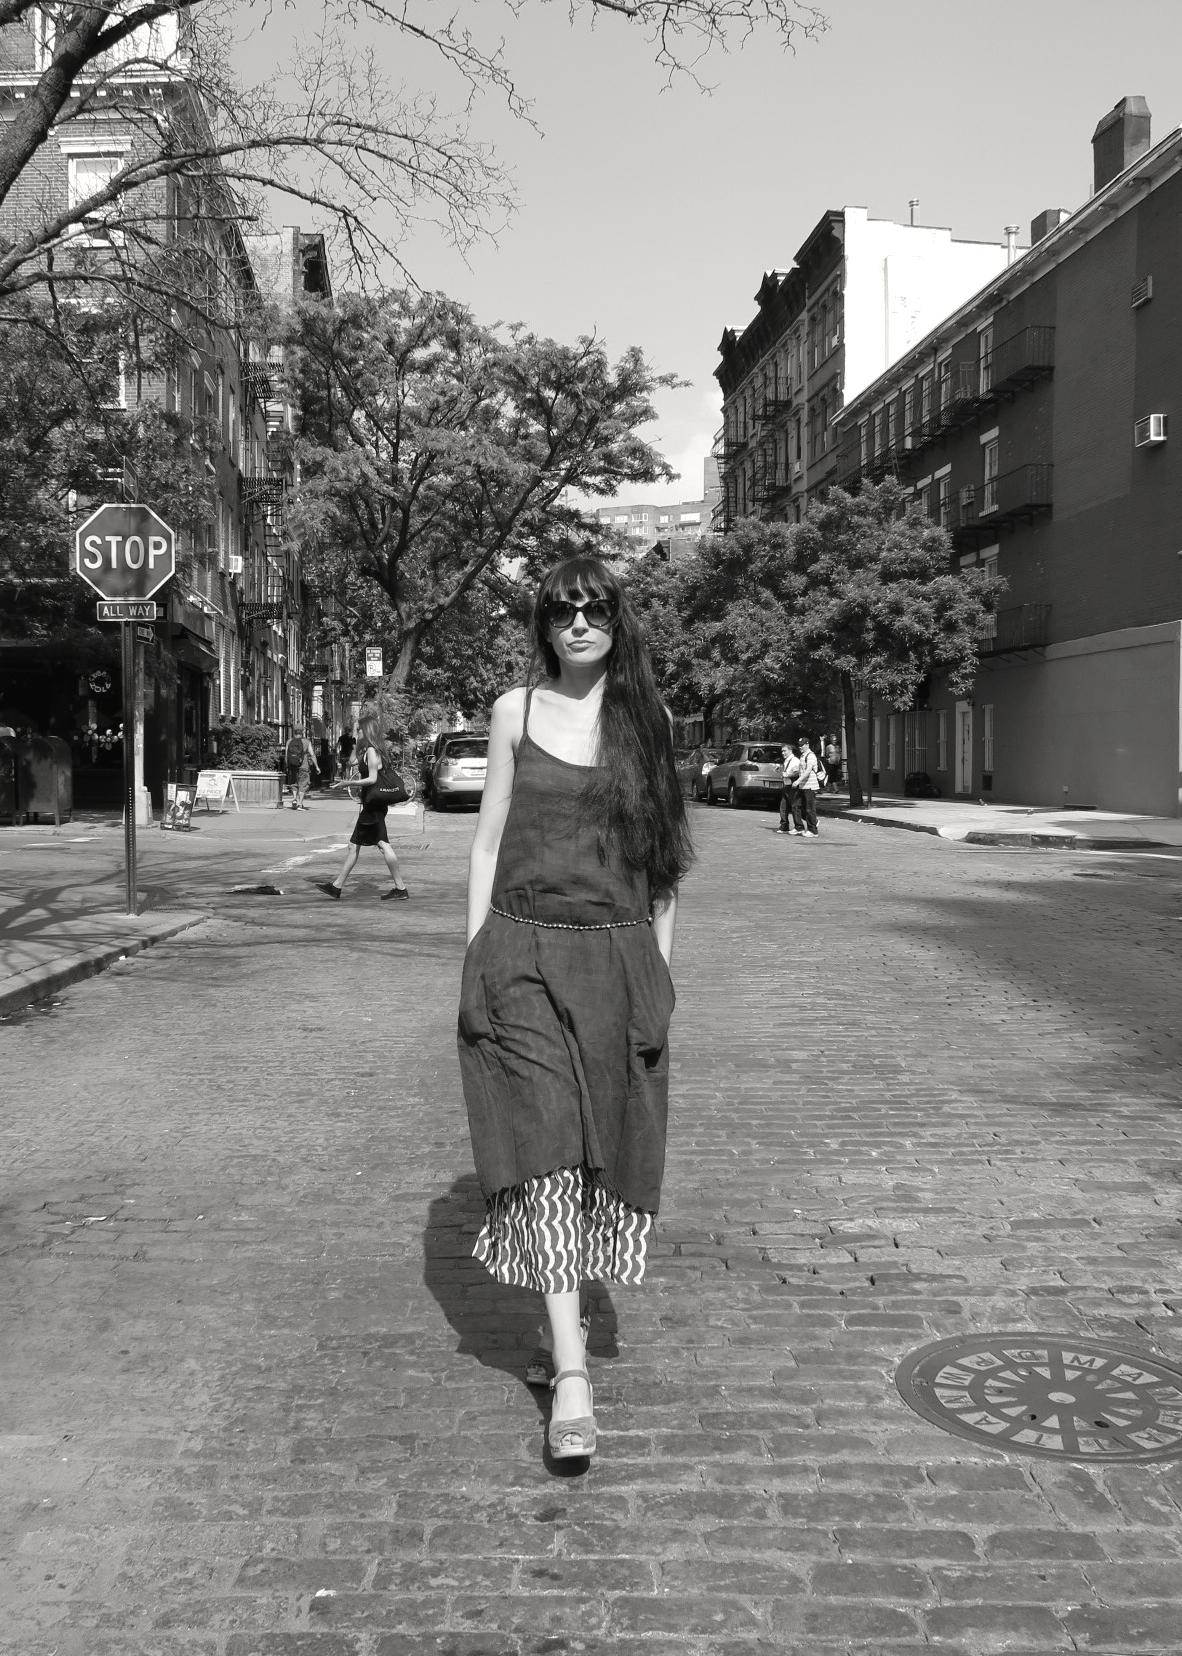 juliet street walk